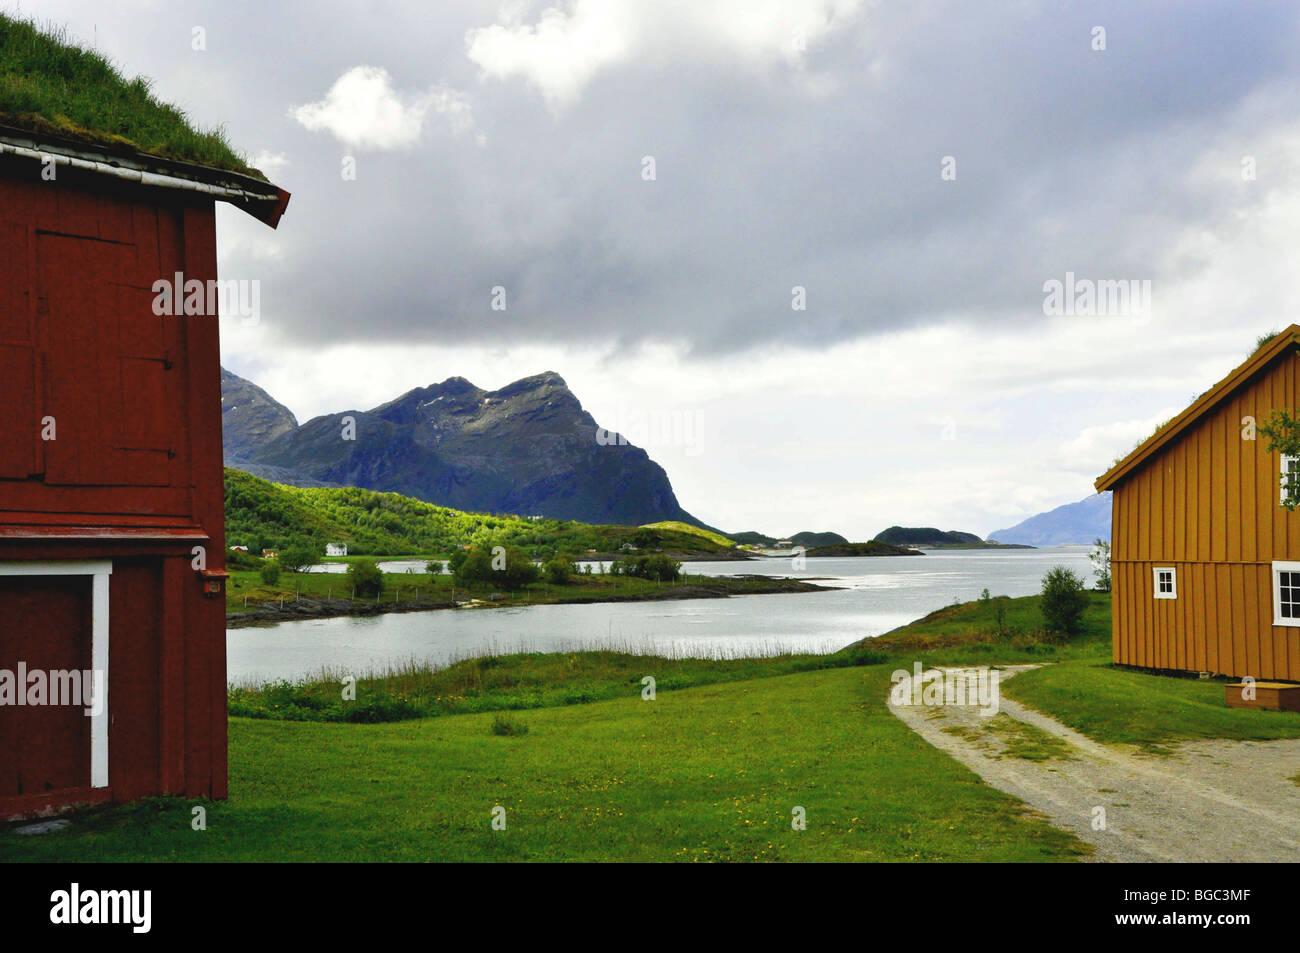 Characteristic wooden buildings and landscape at Kjerringoy  Handelssted  Salten  Nordland Norway - Stock Image